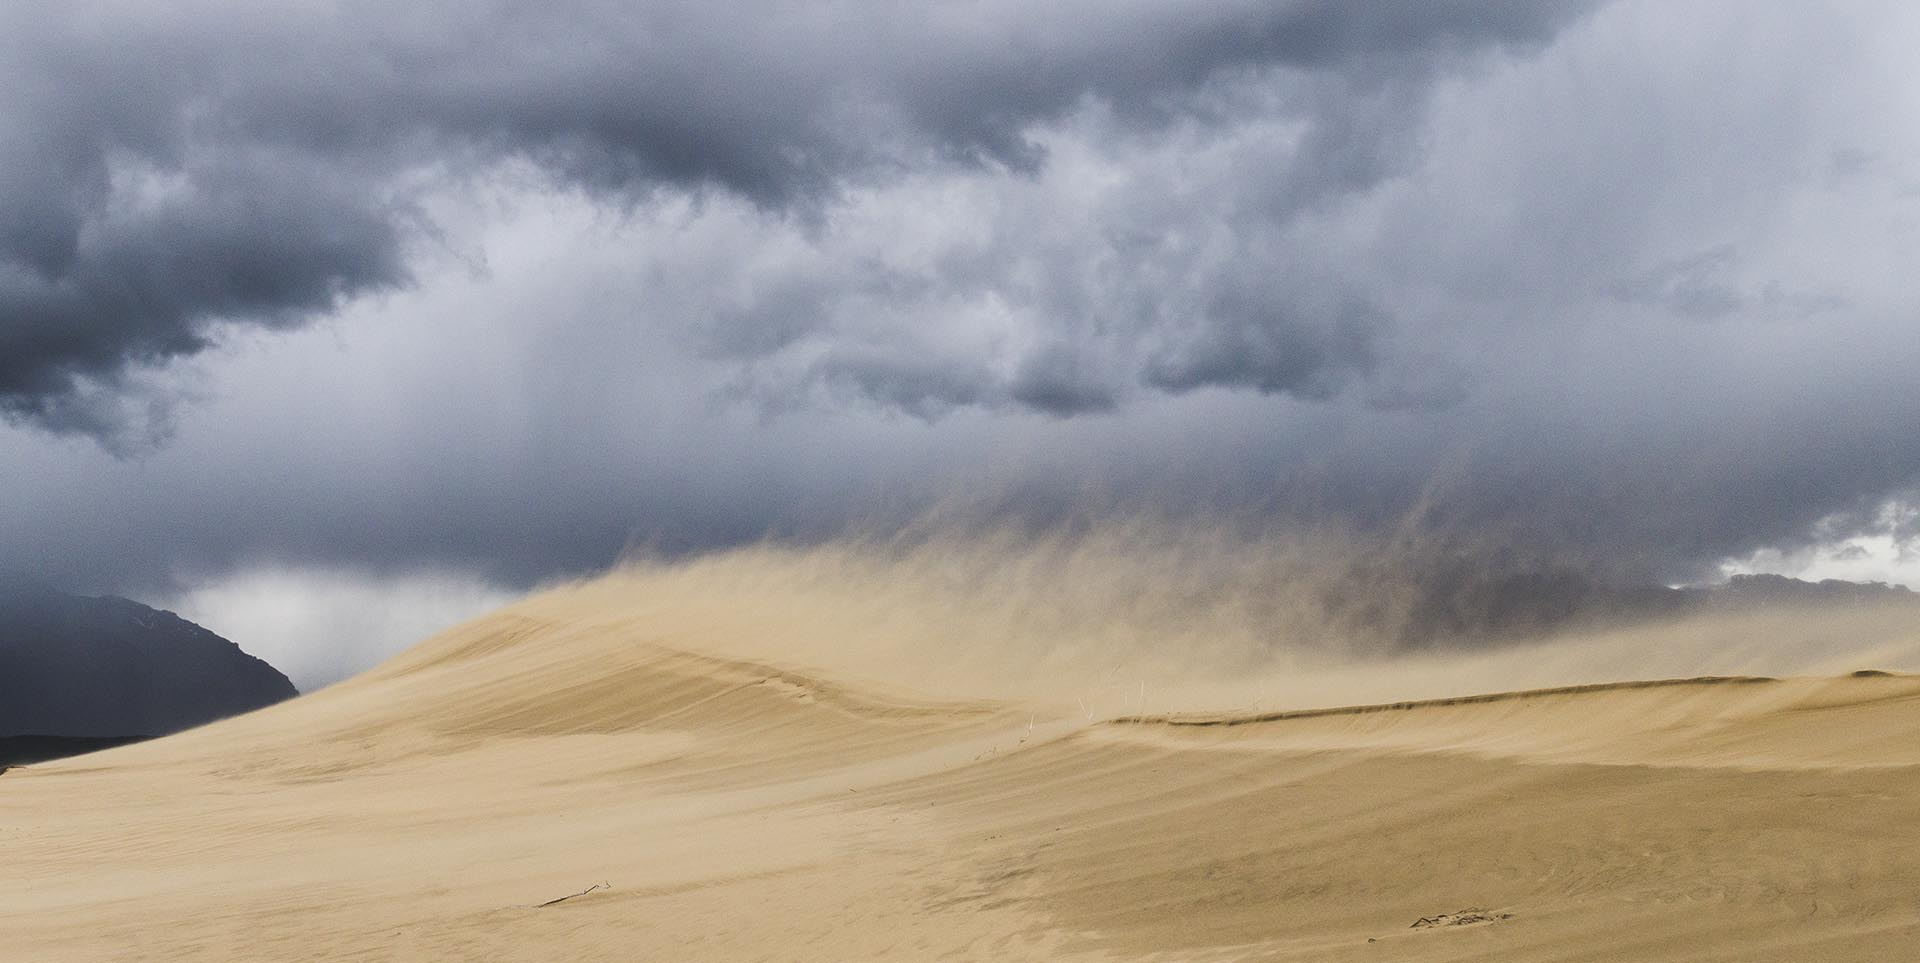 Картинки бури в пустыне